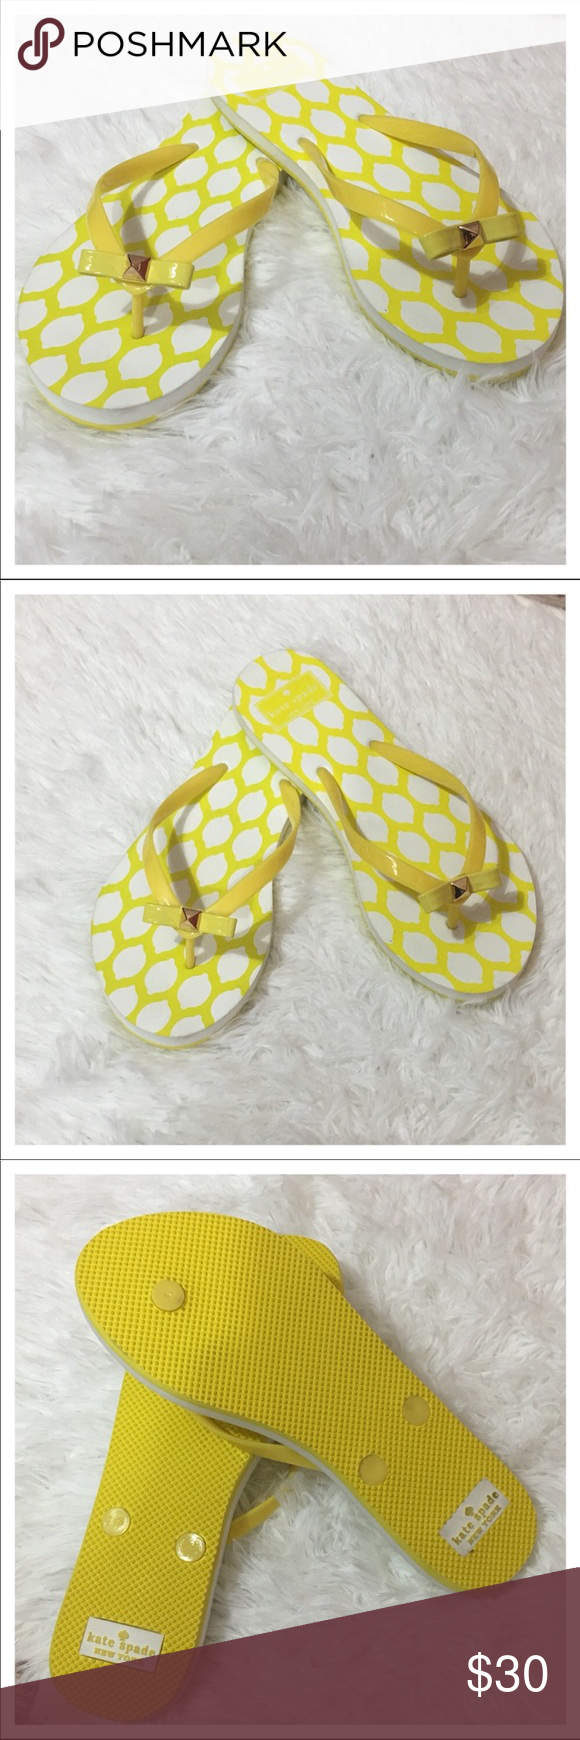 8a7adad7b214 NWOB Kate Spade Nova EVA Flip Flops - Yellow Lemon NWOB Kate Spade Nova EVA  Flip